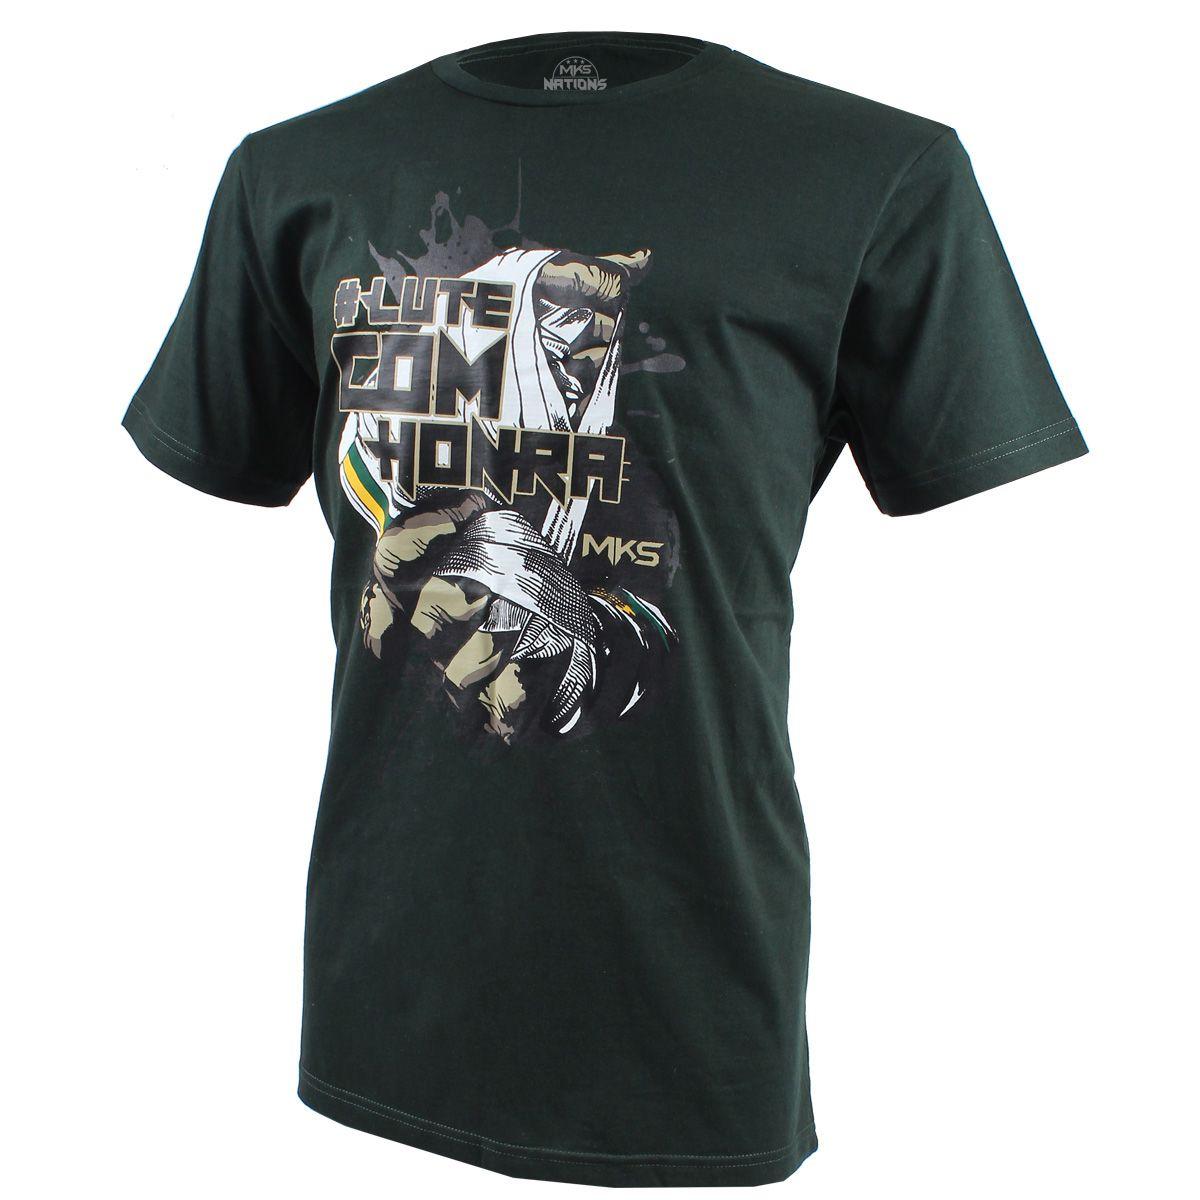 Camiseta MKS COMBAT #Lutecomhonra Cinza Preto